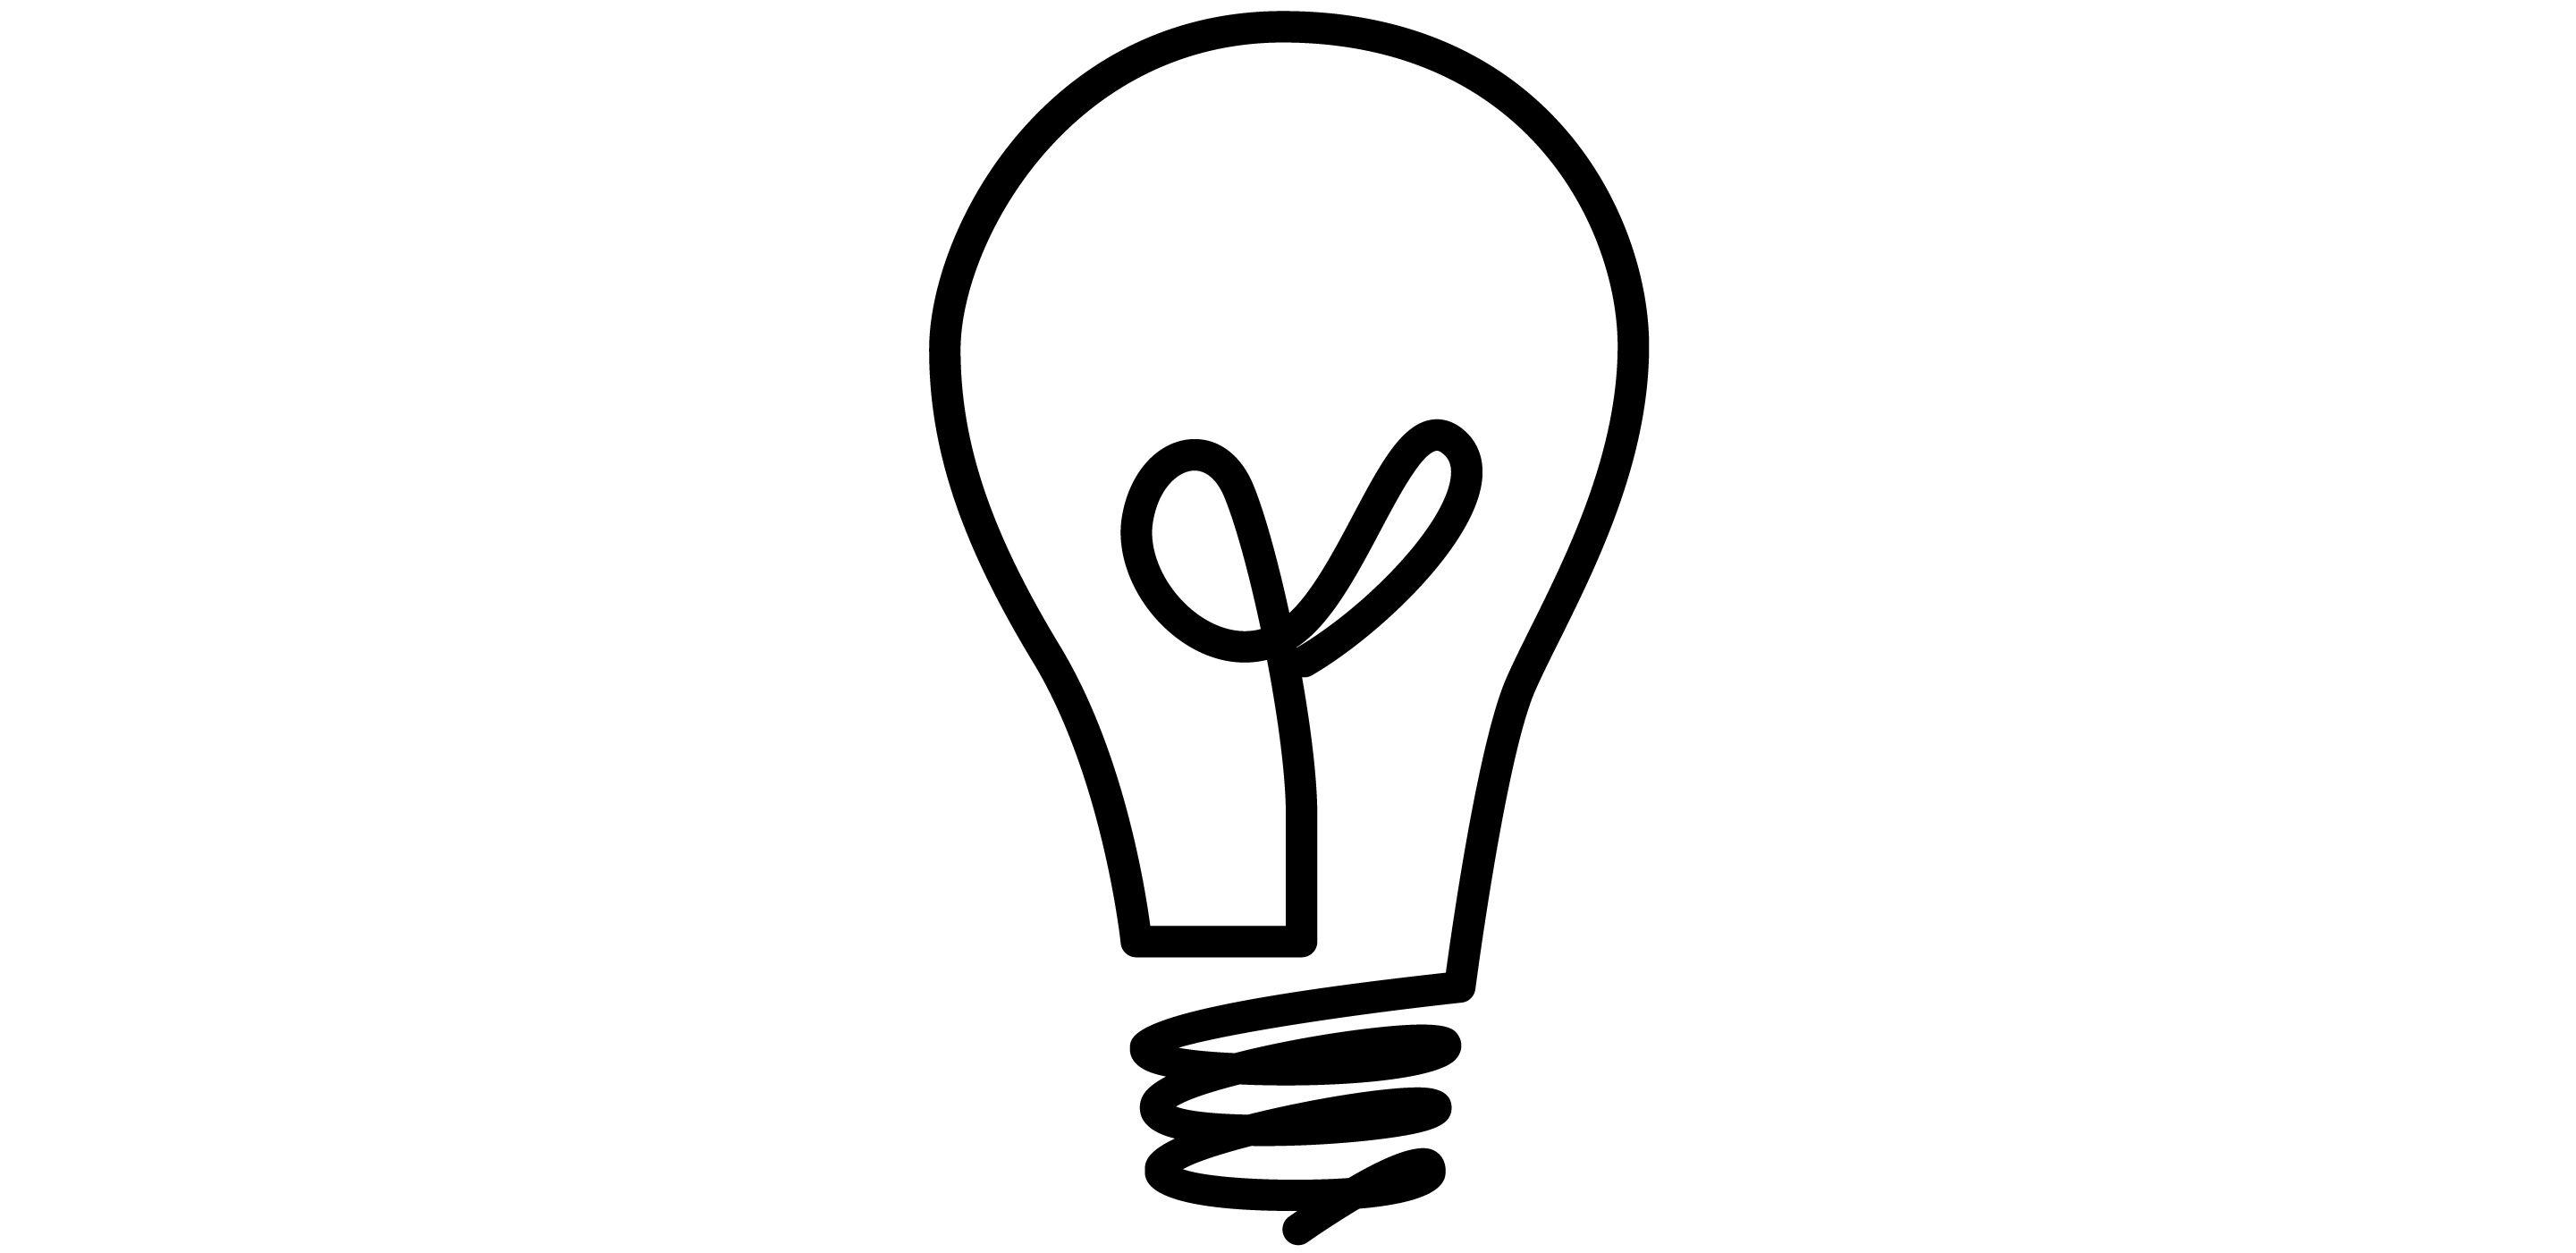 Bulb logo clipart clip art freeuse Lightbulb light bulb clipart images illustrations photos   CJ\'s 60th ... clip art freeuse